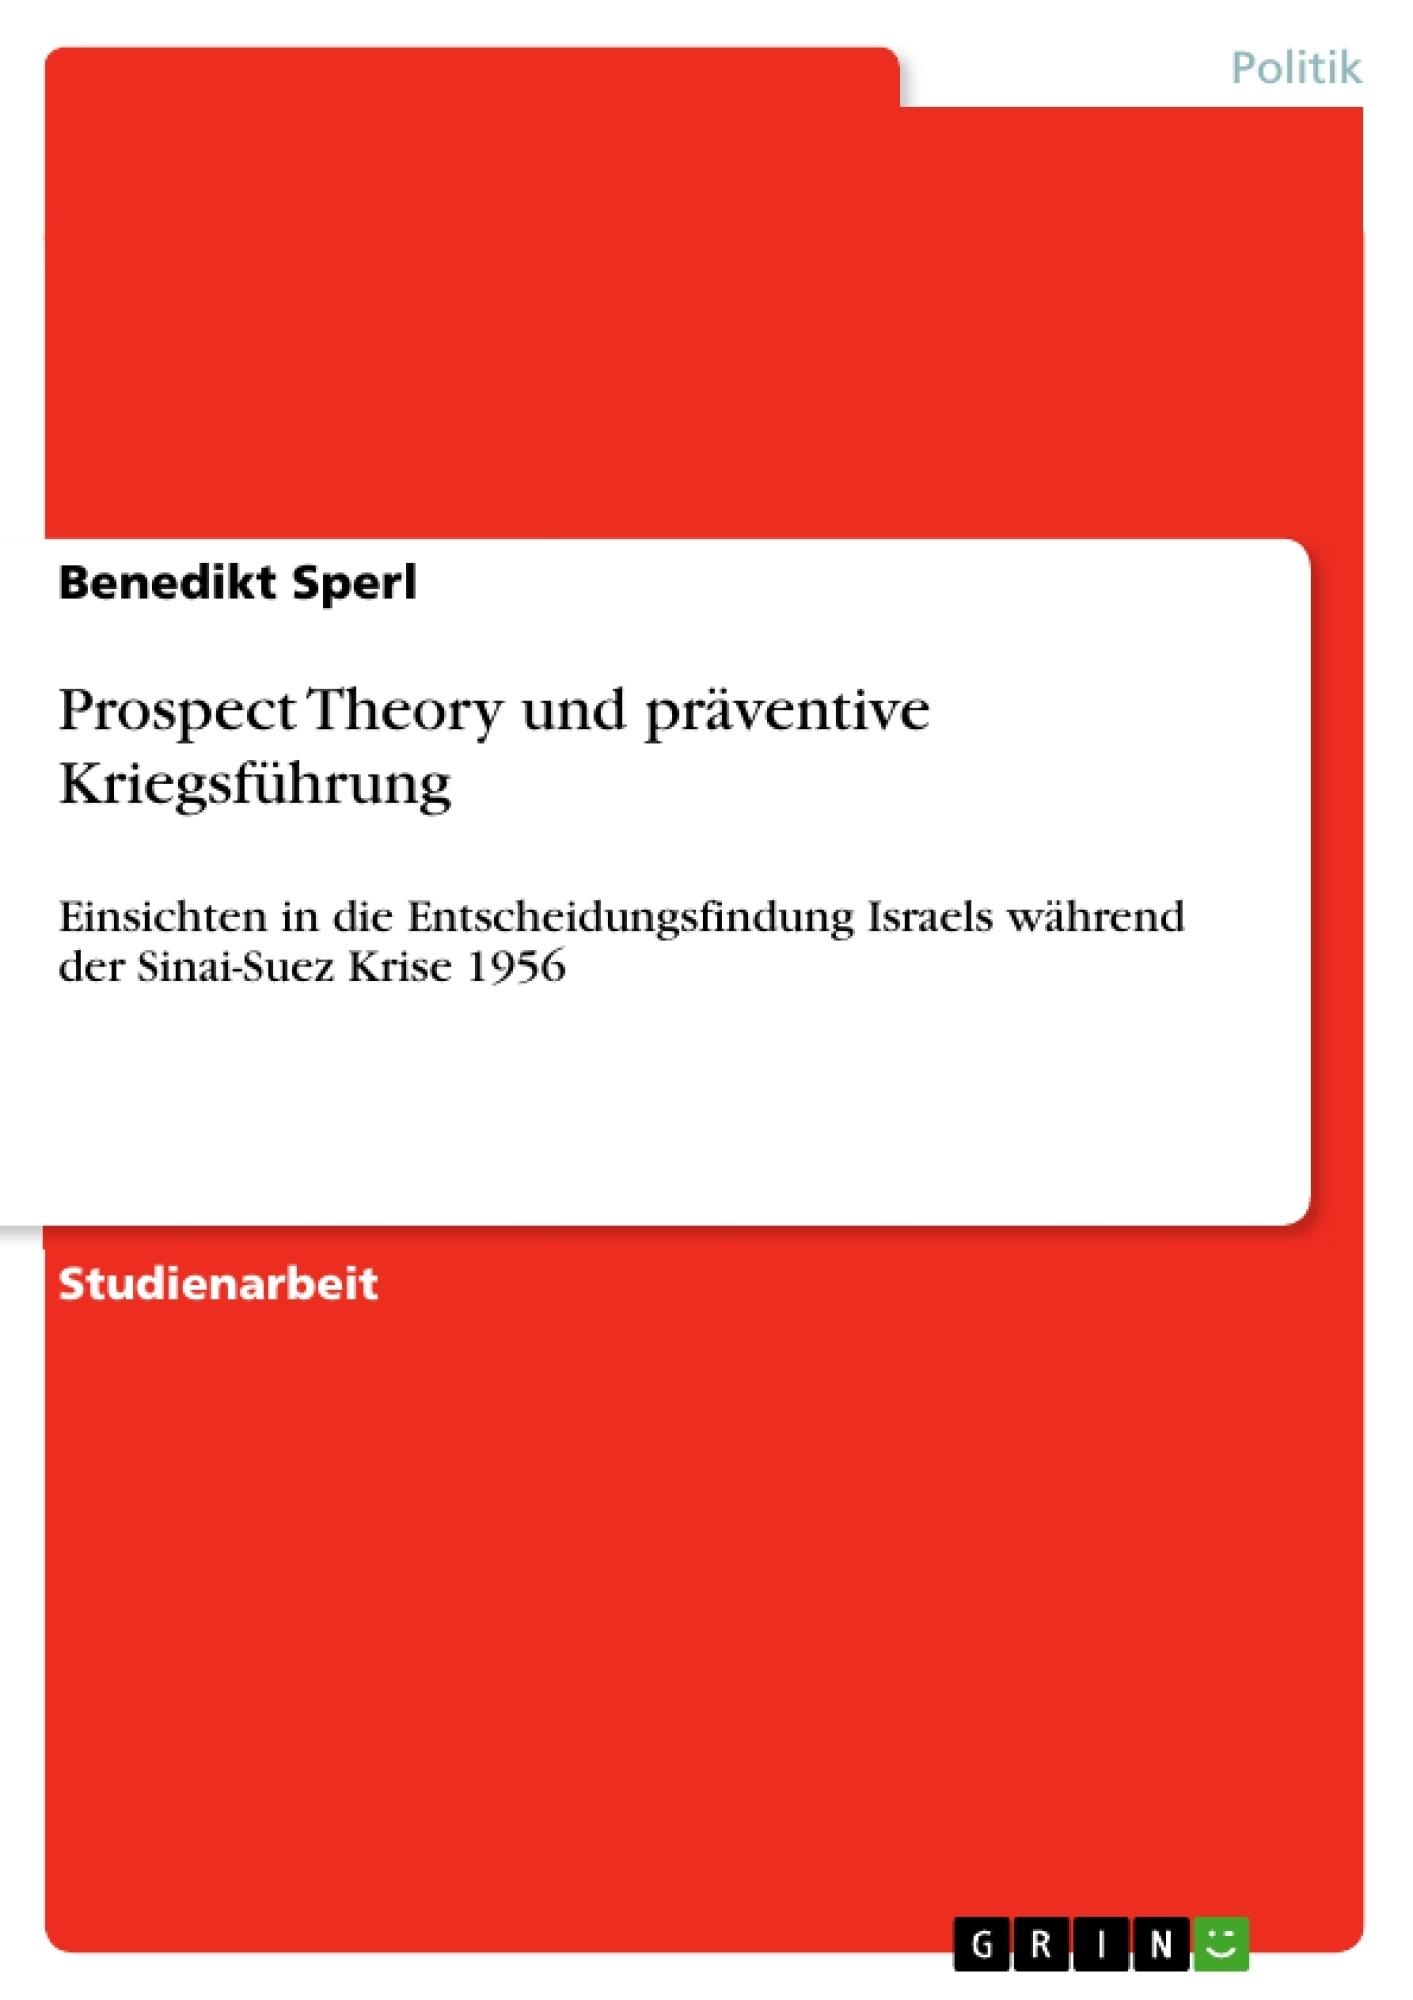 Titel: Prospect Theory und präventive Kriegsführung